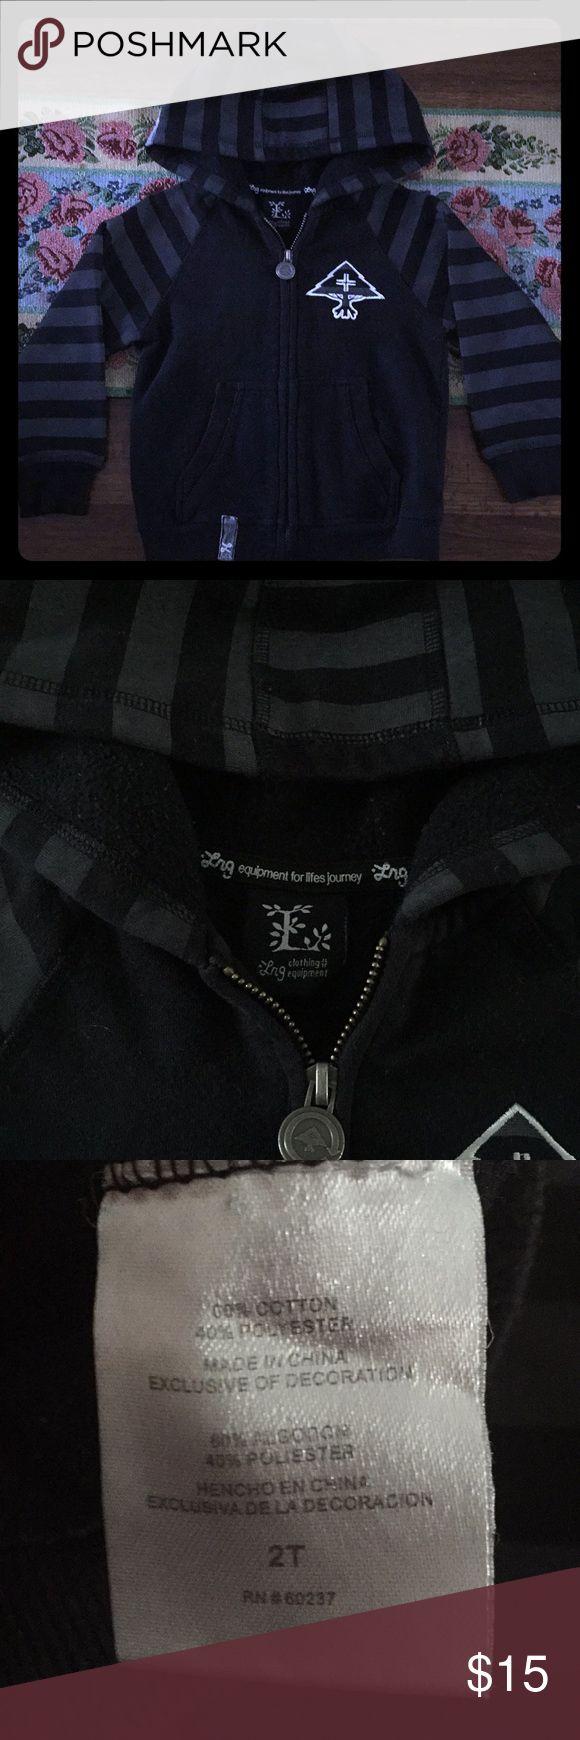 Boys LRG zip up, size 2t black and grey. Black and grey LRG zip up, size 2t. Lrg Shirts & Tops Sweatshirts & Hoodies